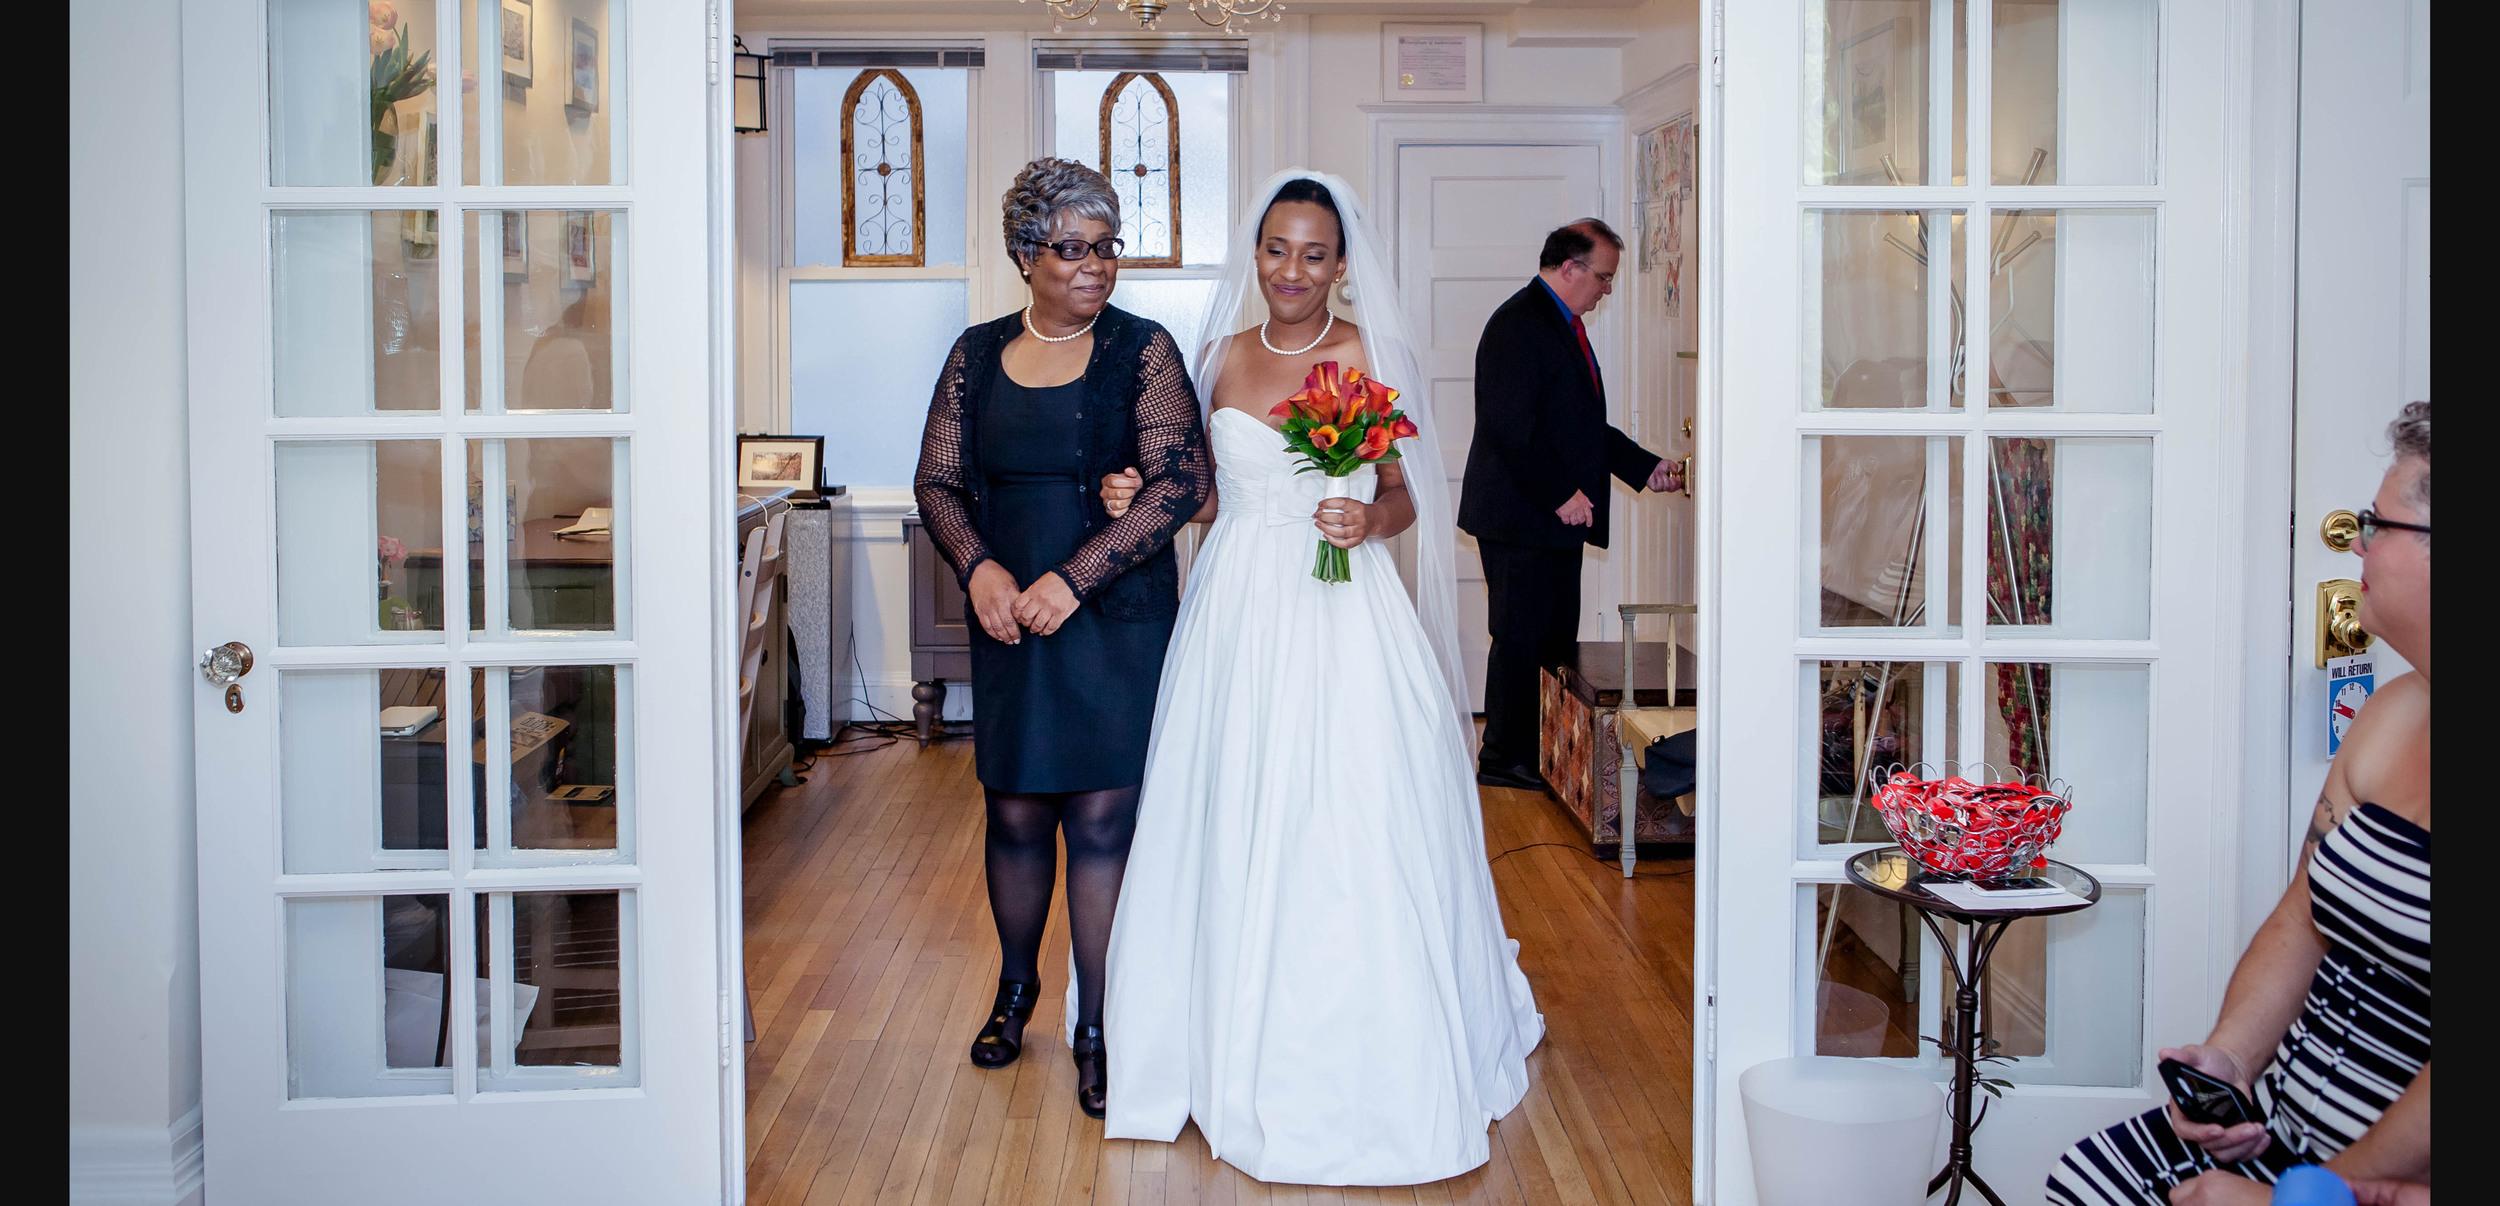 Watermark - Anne & Sherice Wedding-017.jpg